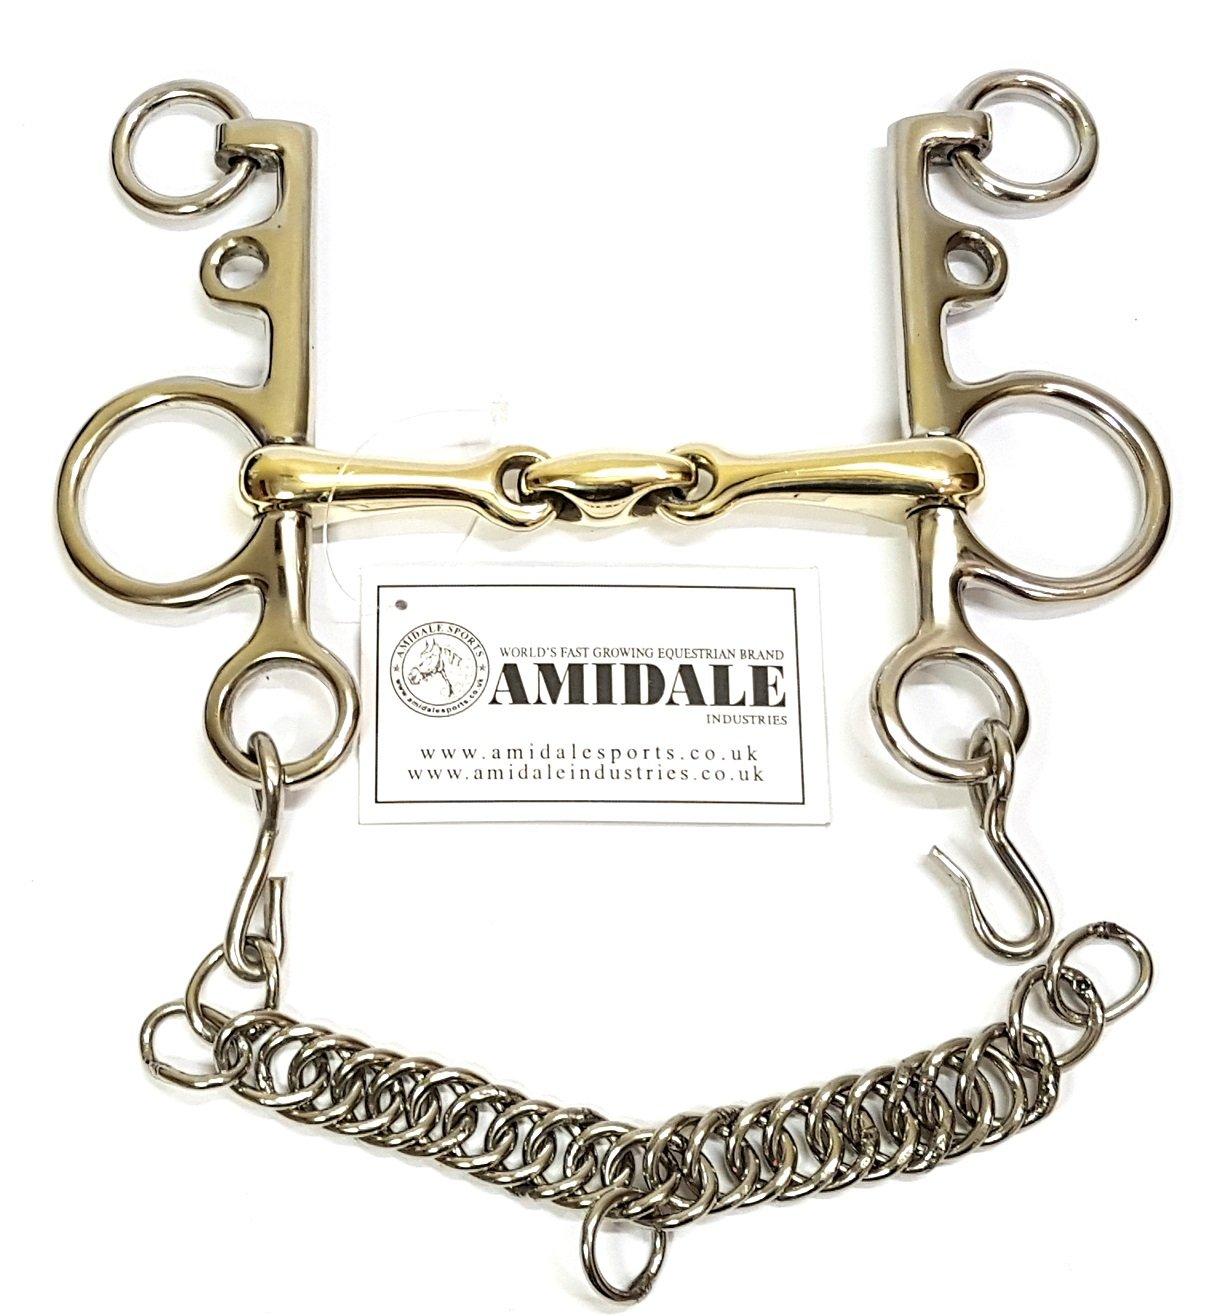 Amidale Mouth Pelham Double Jointed Lozenge Copper Mix Horse Bit Sports